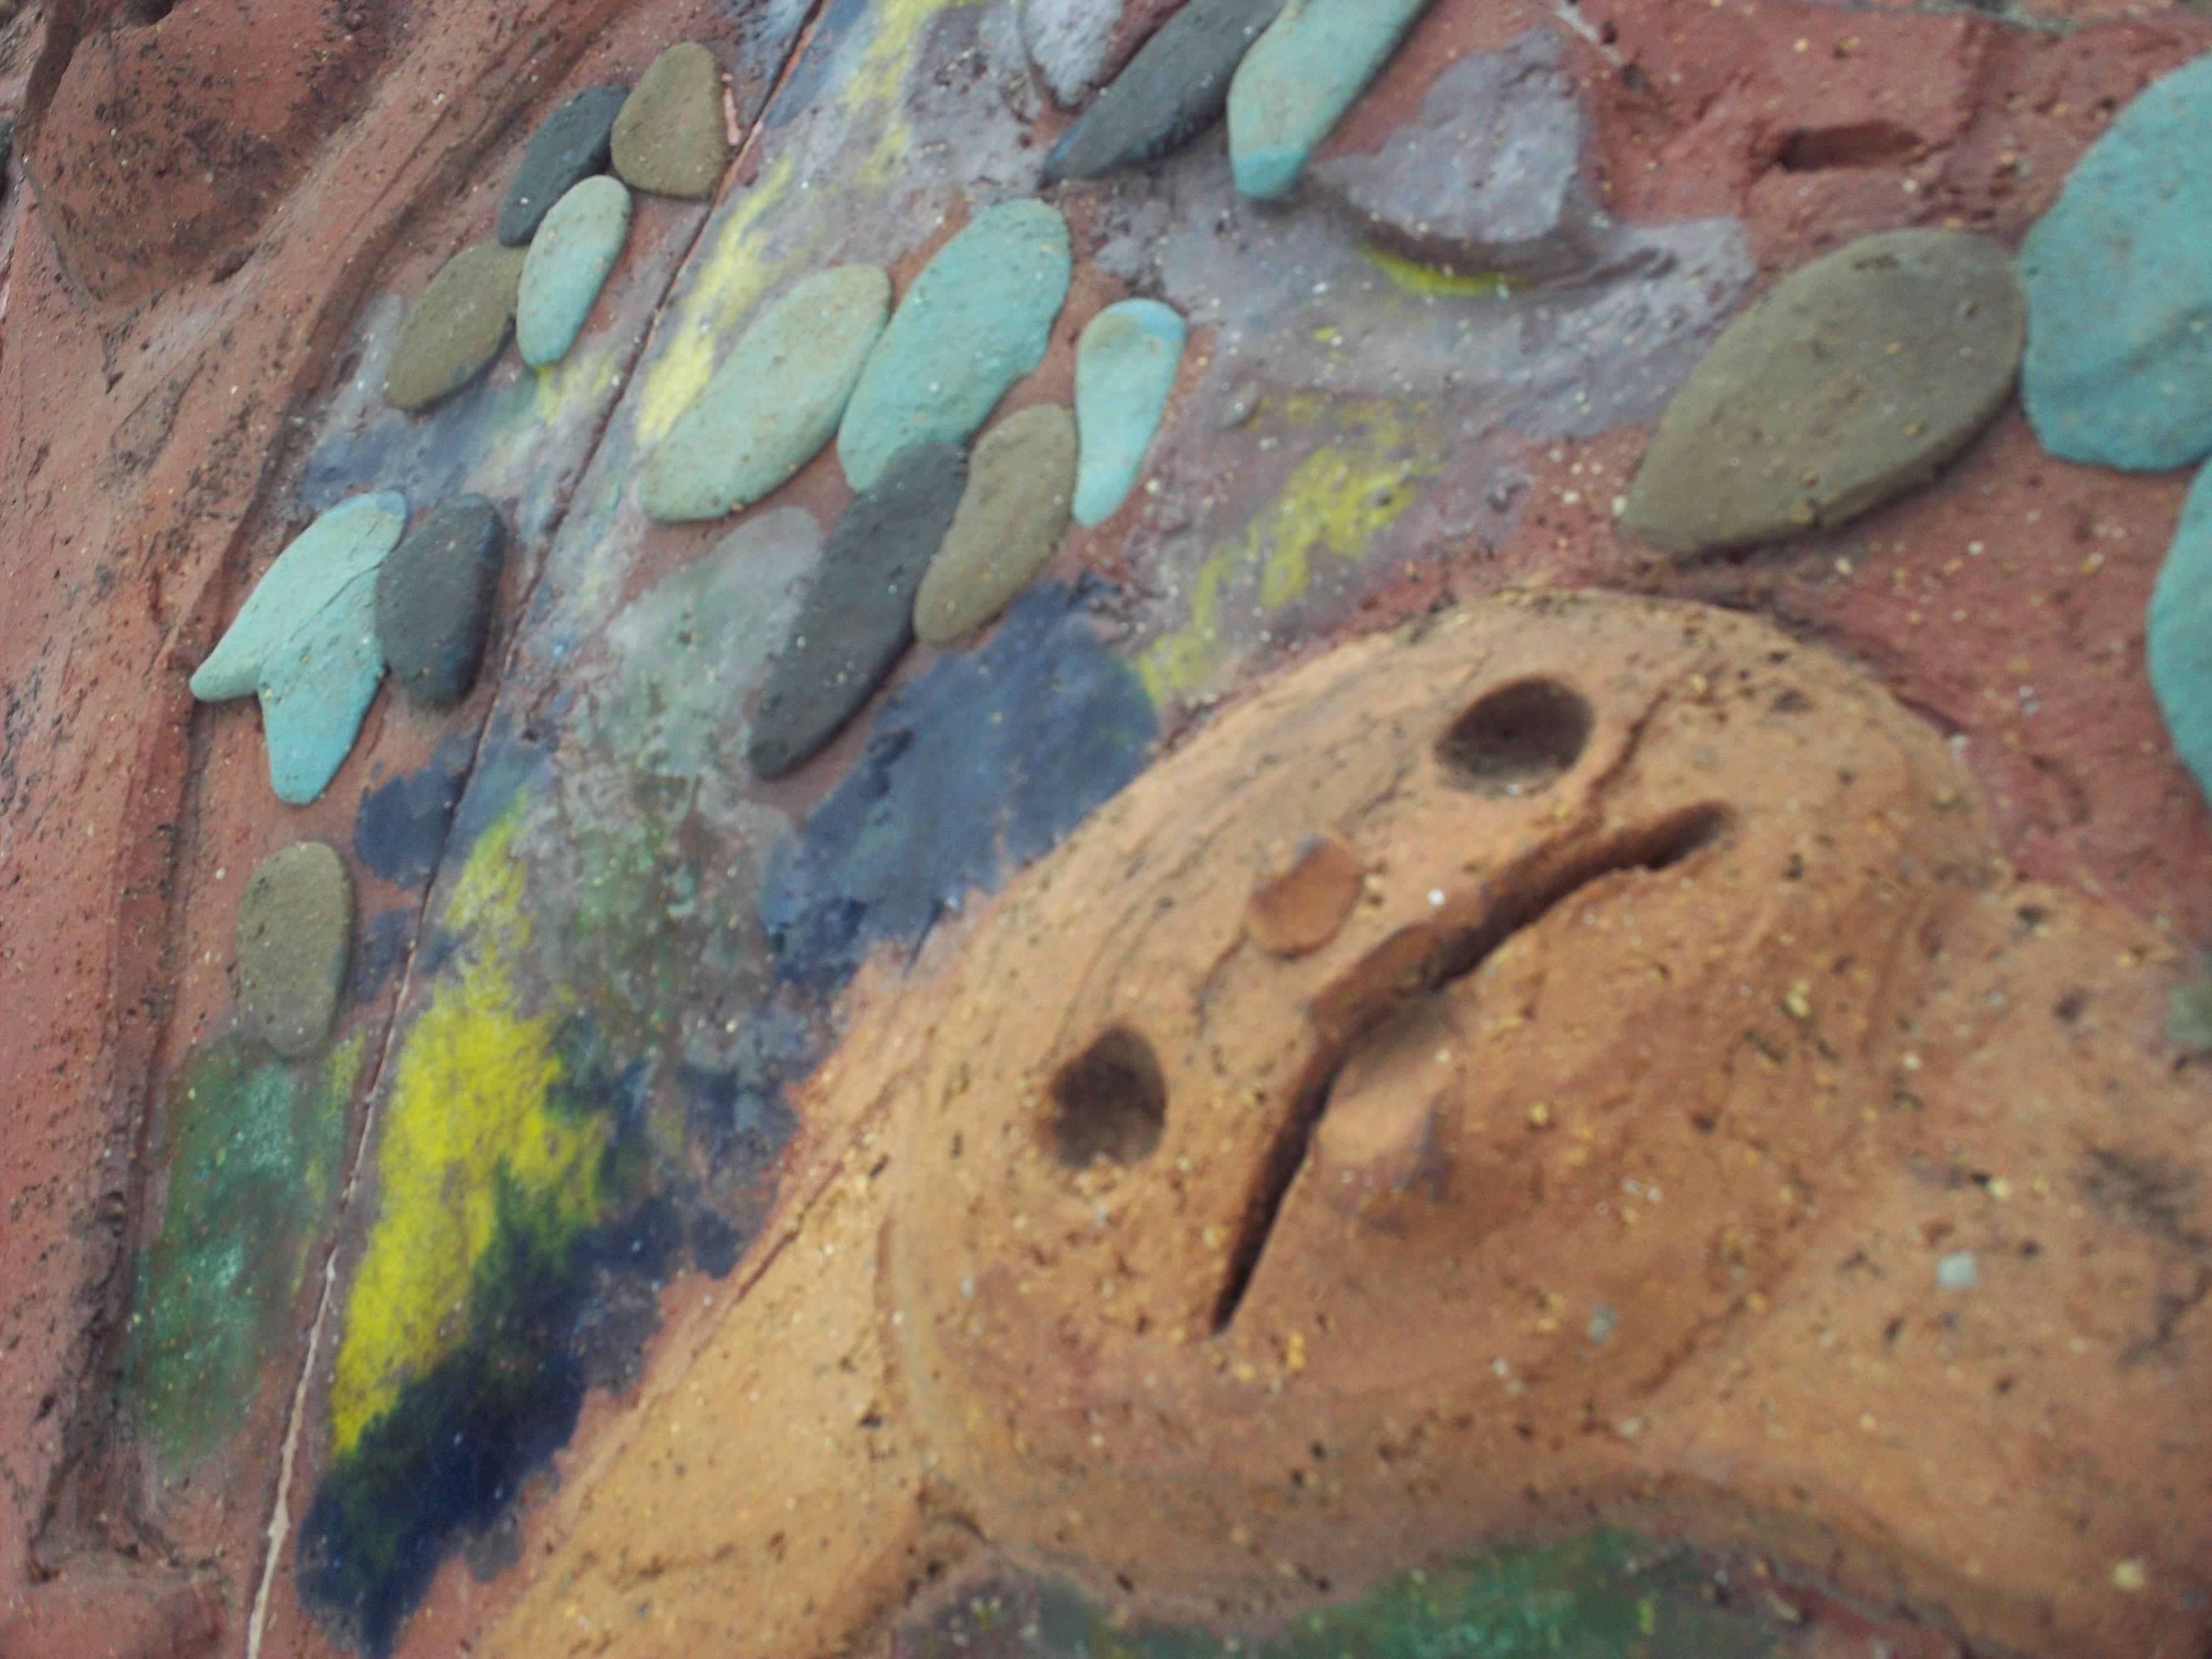 <b>子供が粘土で作ったような壁画を発見! 思わず近寄ってパチリ。EASYSHARE SPORT C123 / 約2.4MB / 4,000×3,000 / 1/80秒 / F4.5 / 0EV / ISO80/ プログラムAE / WB:オート / 6.3mm</b>